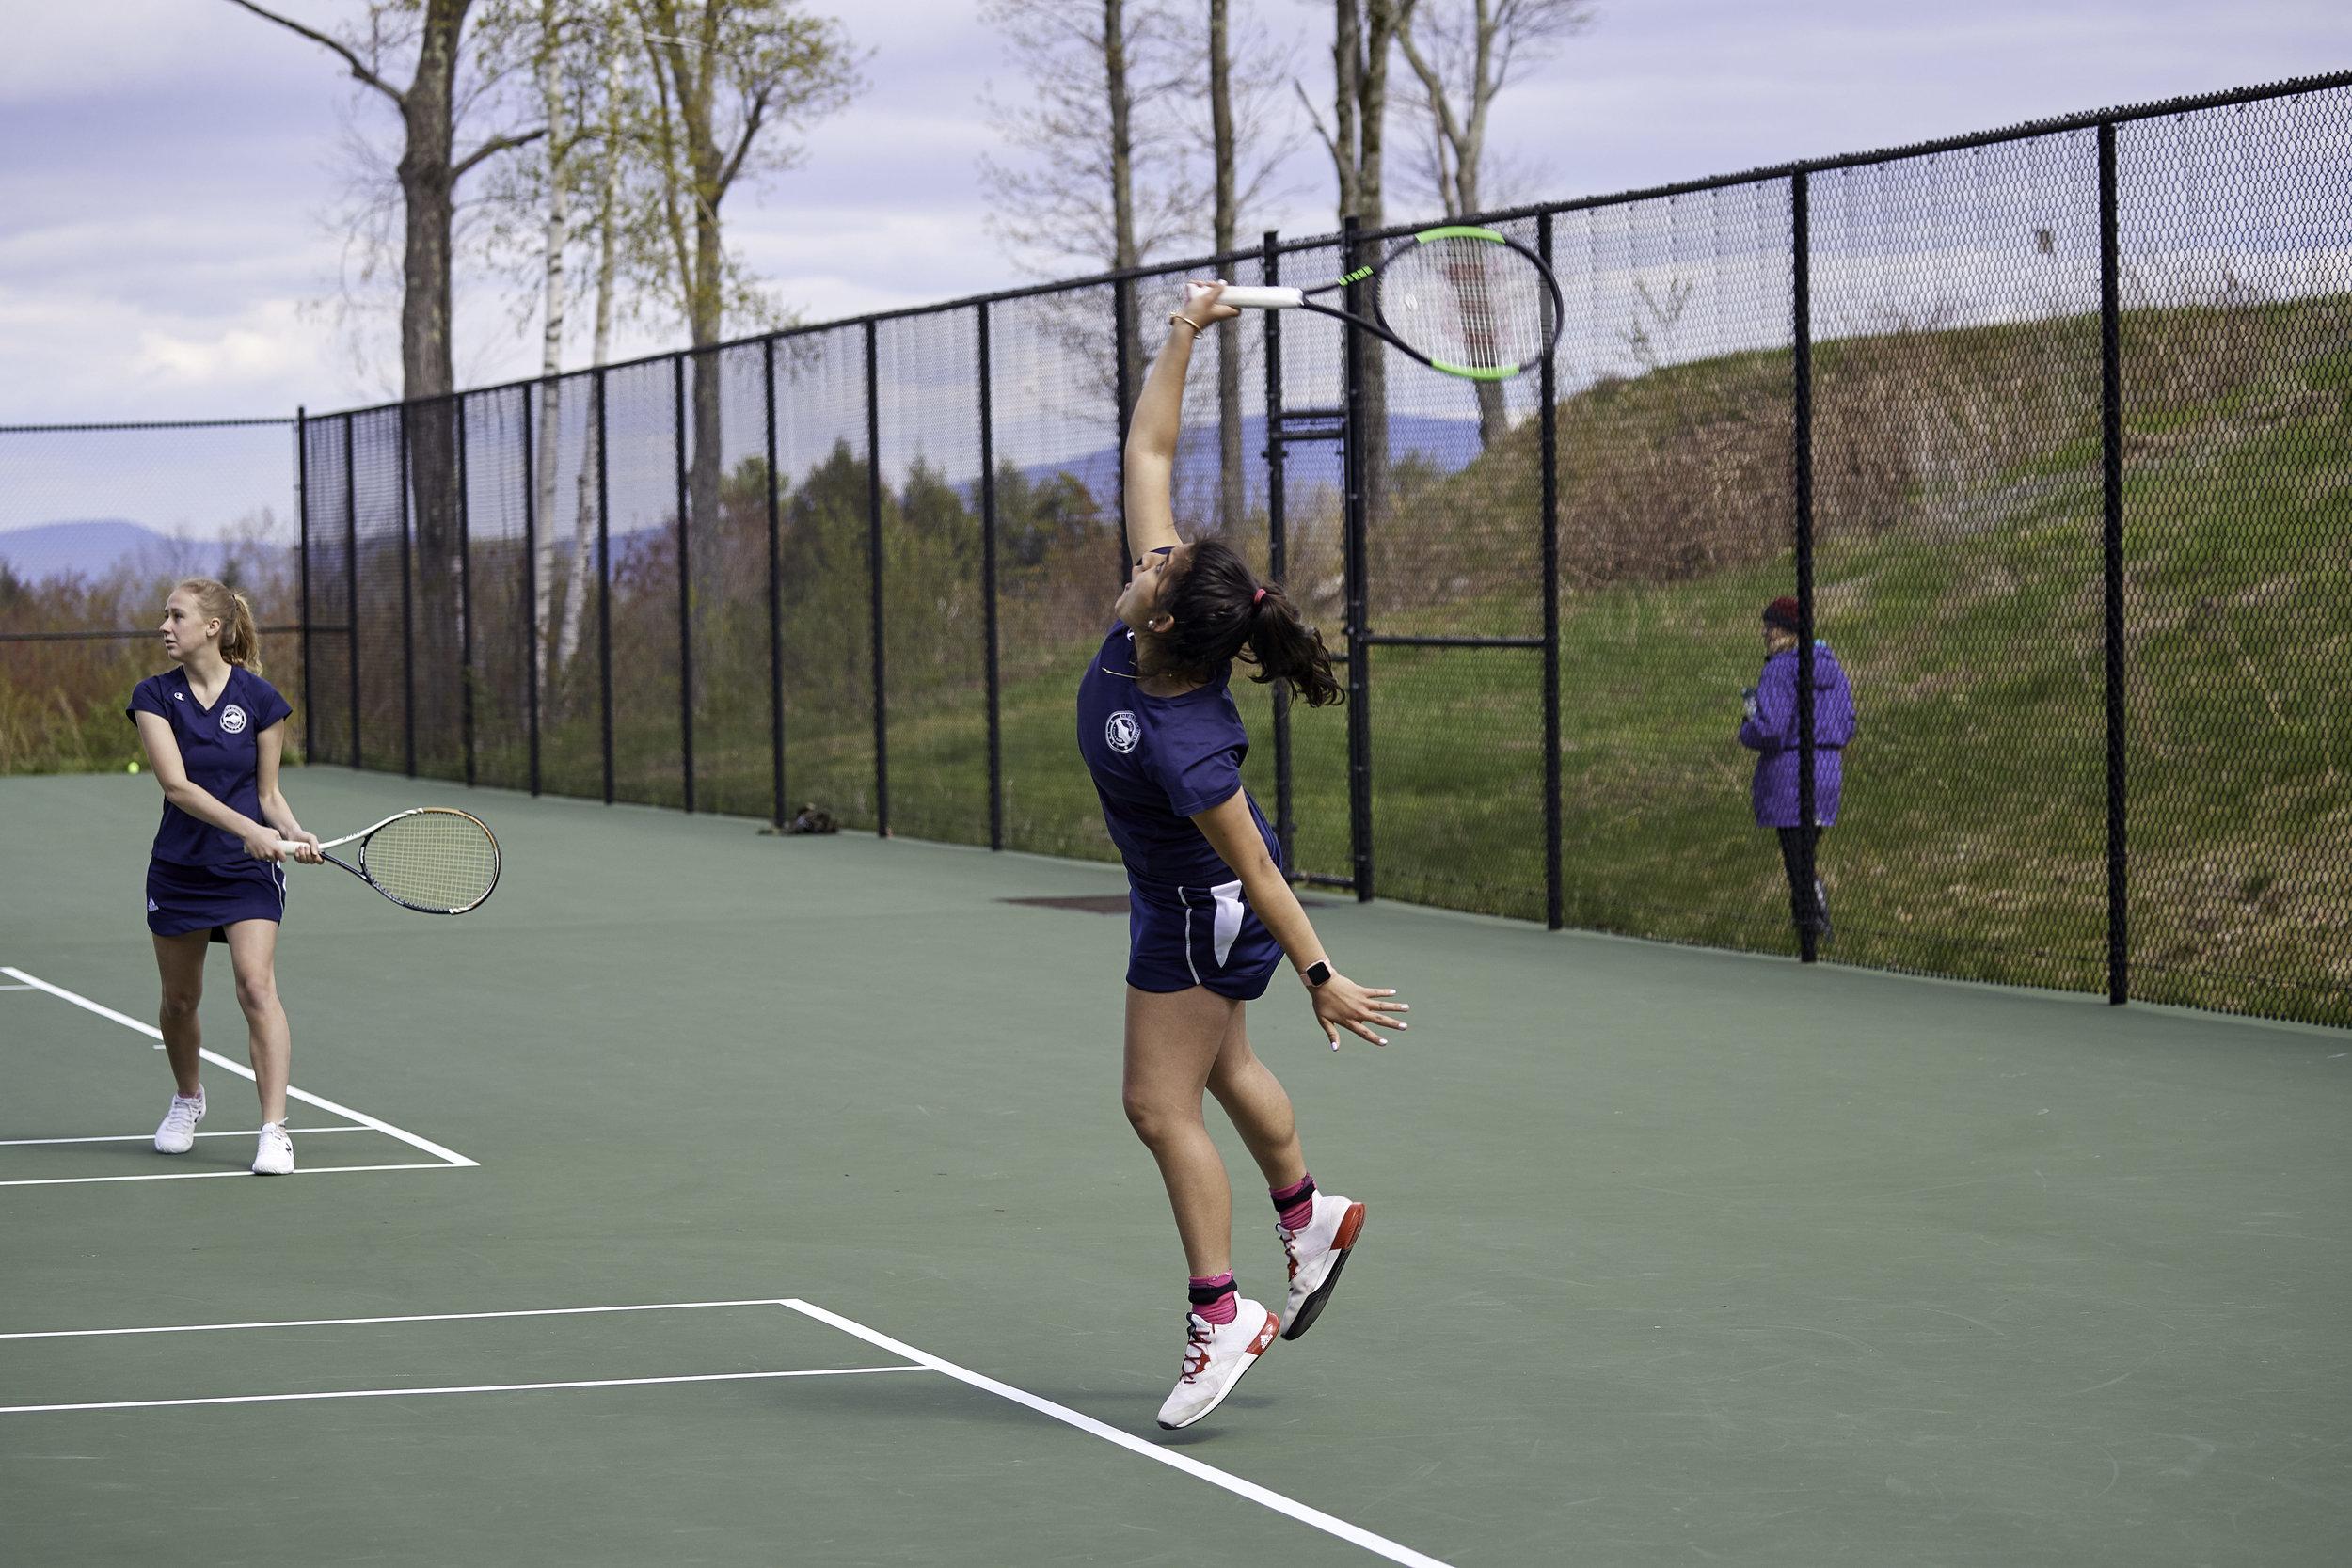 Girls Tennis vs. Winchendon School - May 15, 2019 -195168.jpg